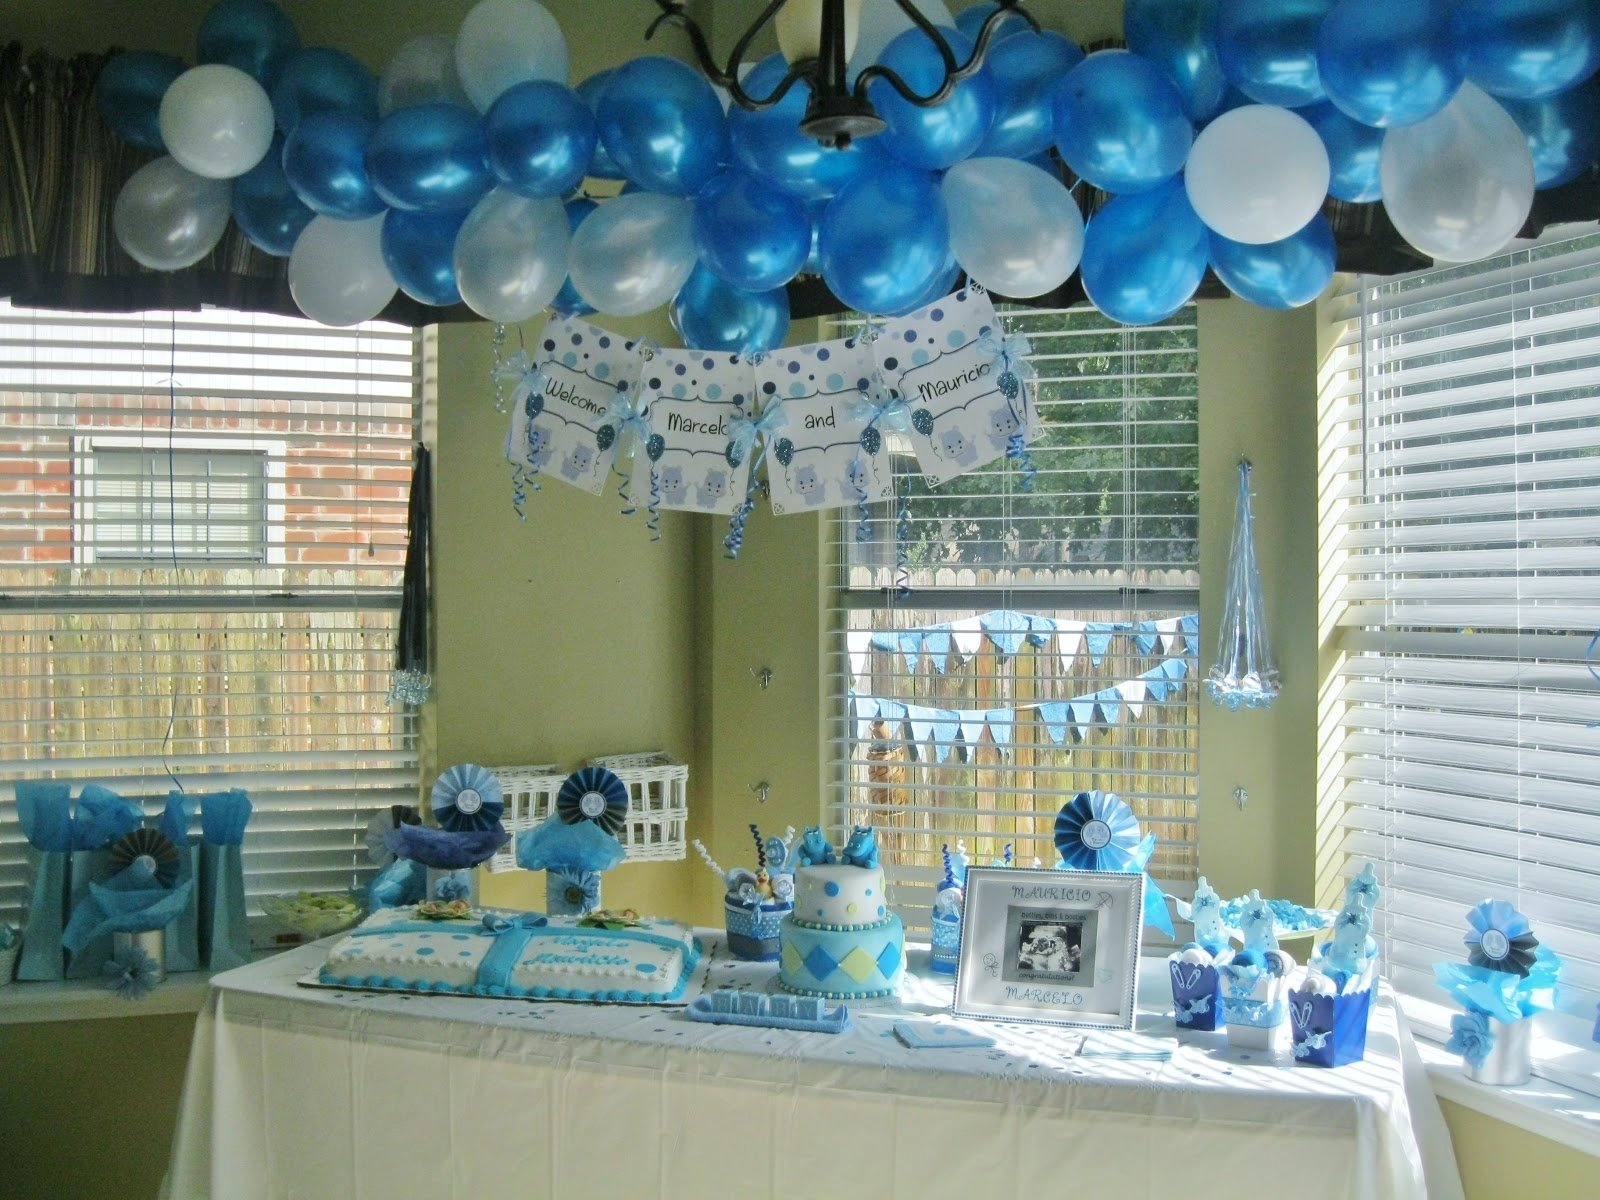 10 Amazing Baby Shower Ideas For Boy amazing baby shower ideas for boys 17 party snacks white chocolate 2020